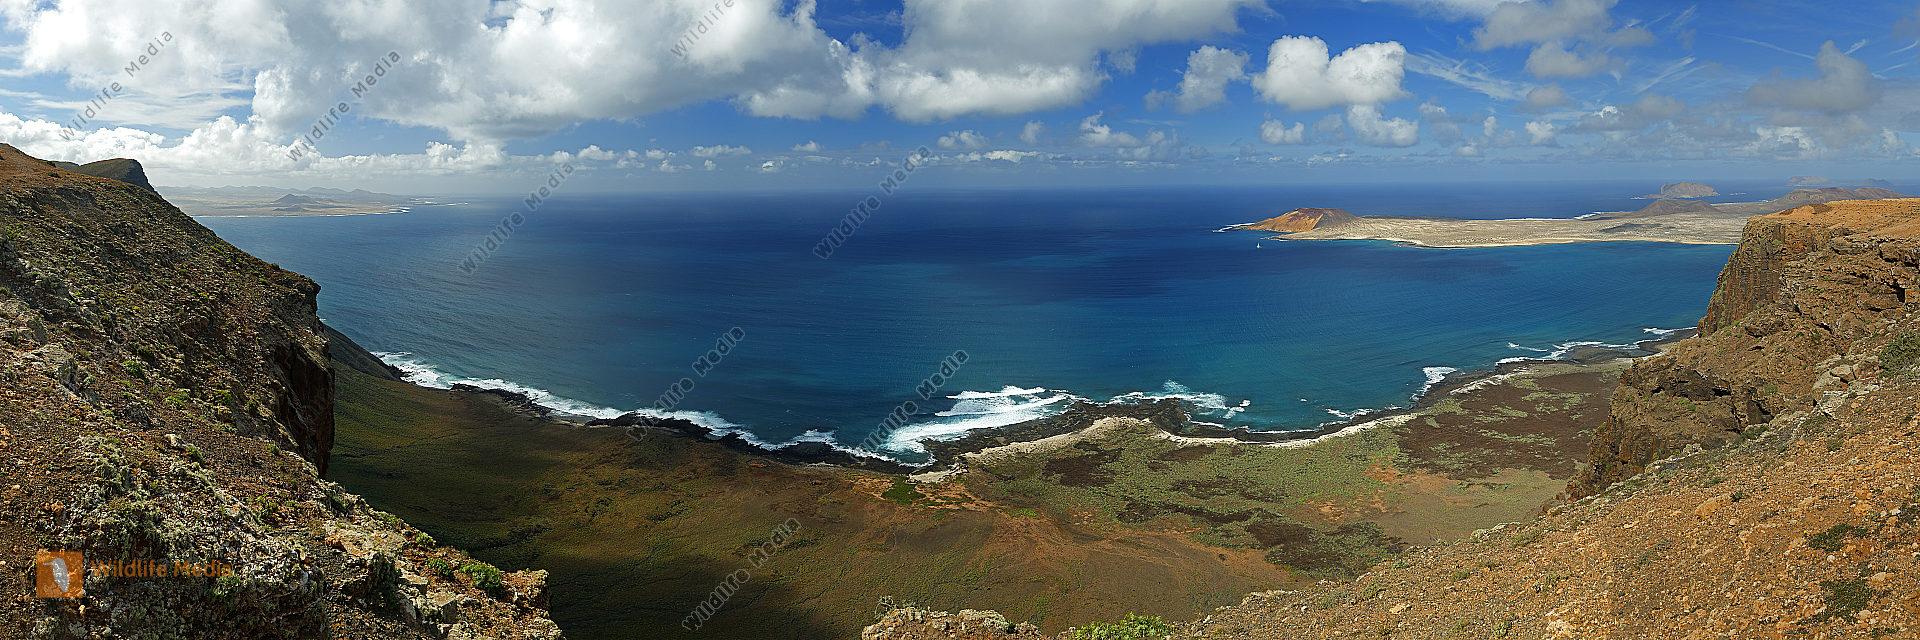 Lanzarote Landschaft Panorama